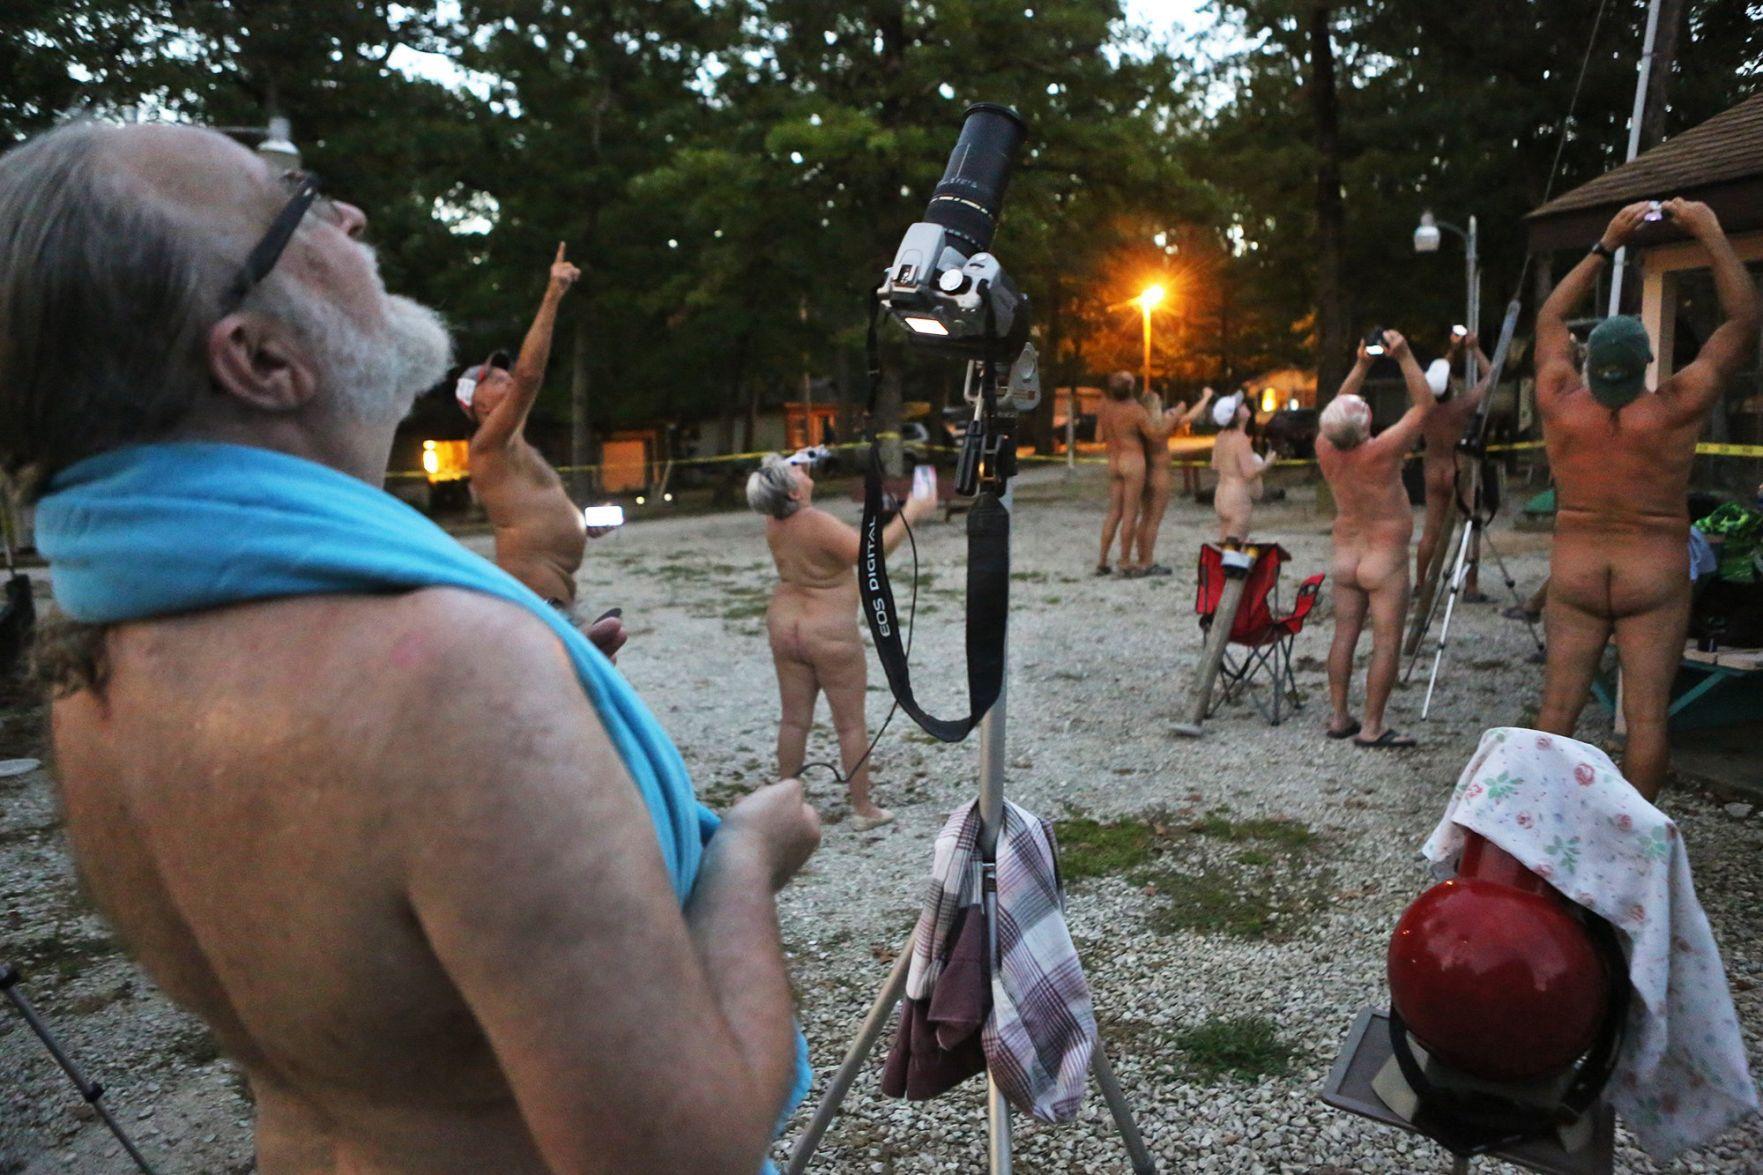 Nudist camps in san antonio texas images 972